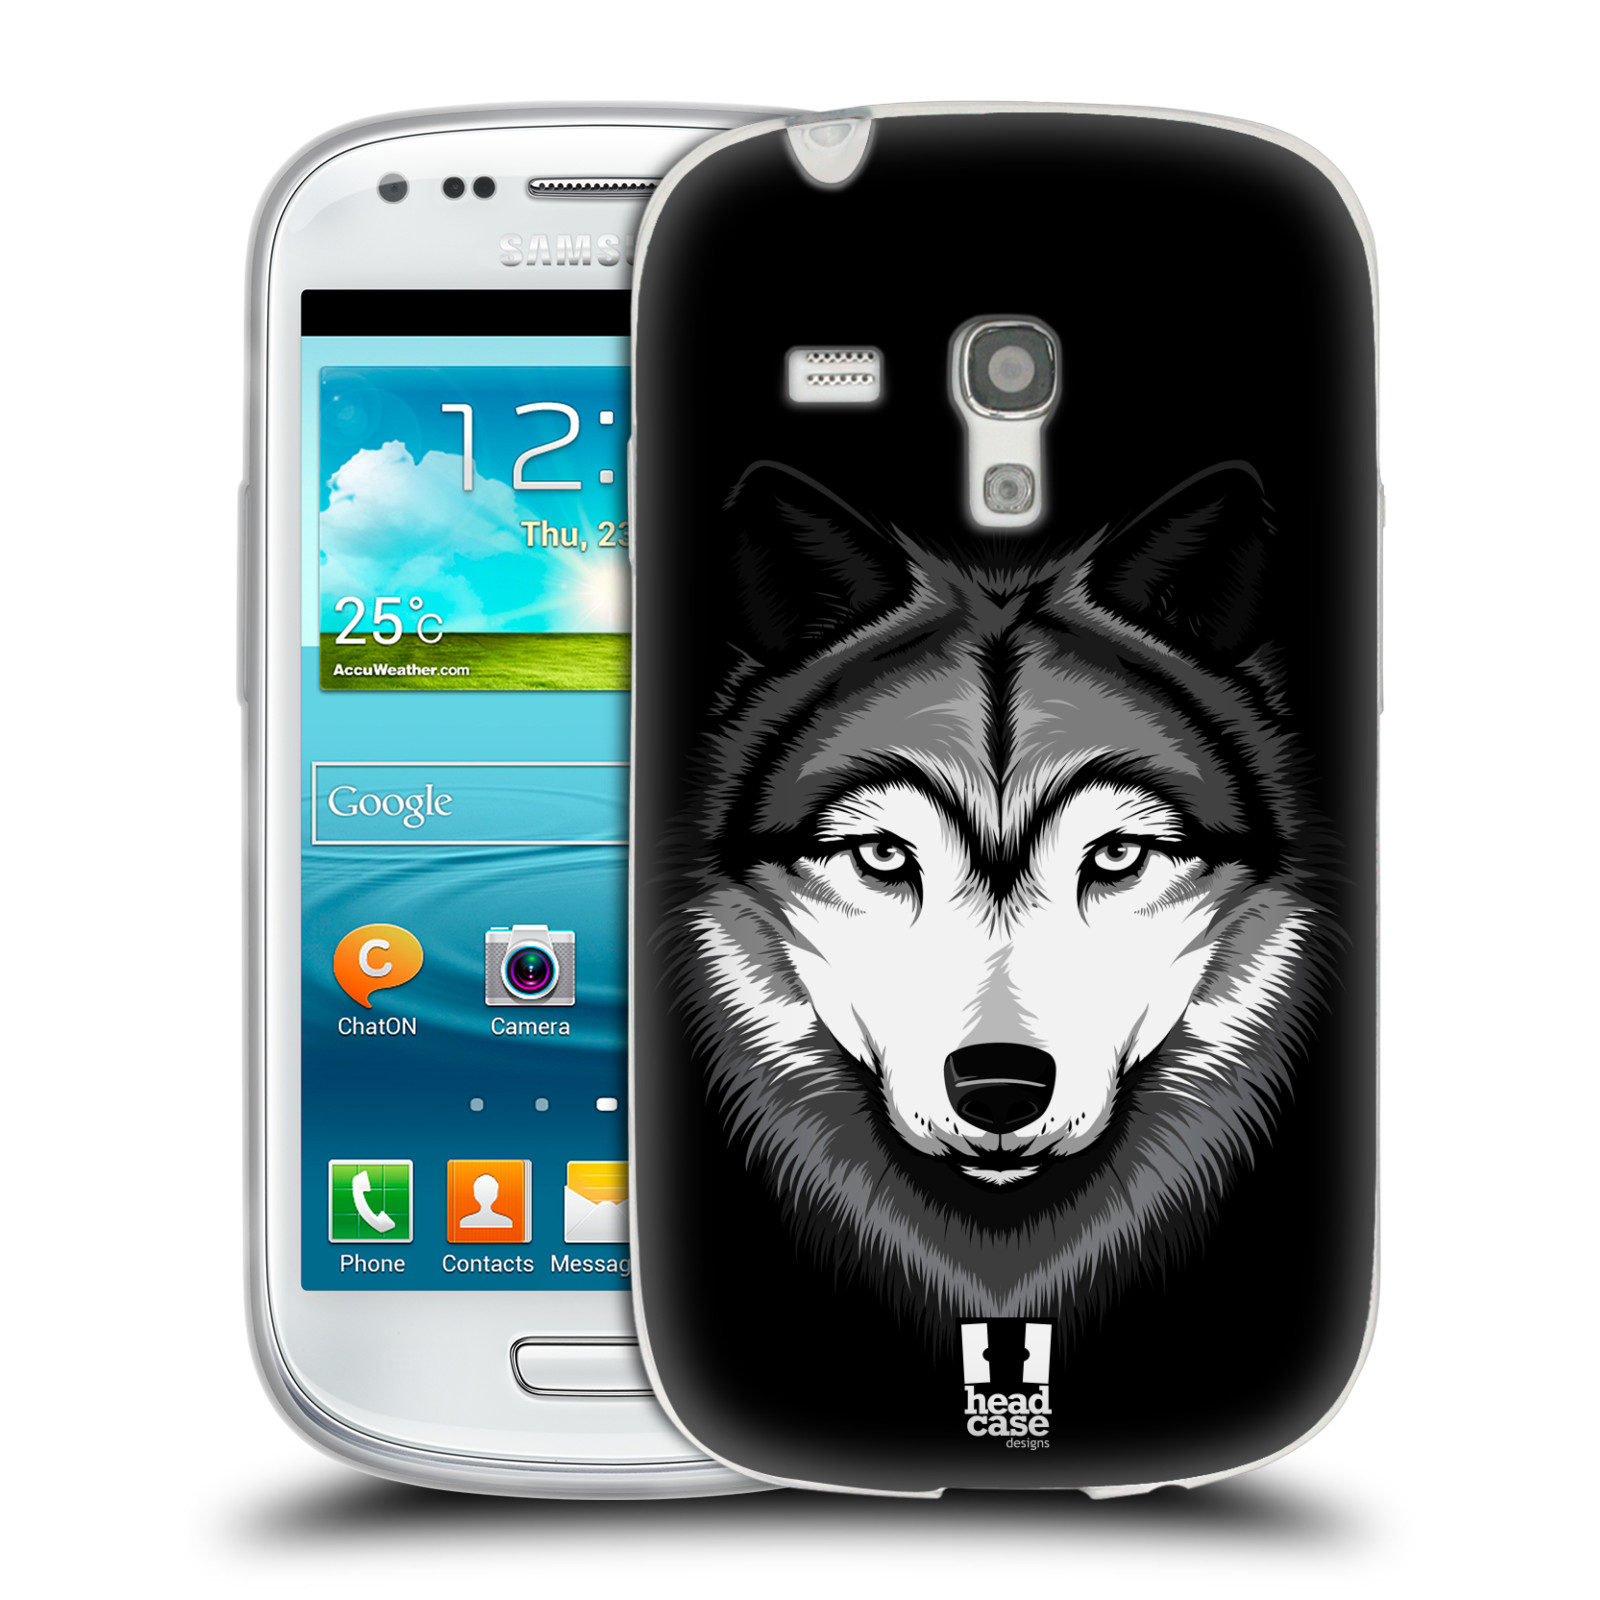 HEAD CASE silikonový obal na mobil Samsung Galaxy S3 MINI i8190 vzor Zvíře kreslená tvář 2 vlk